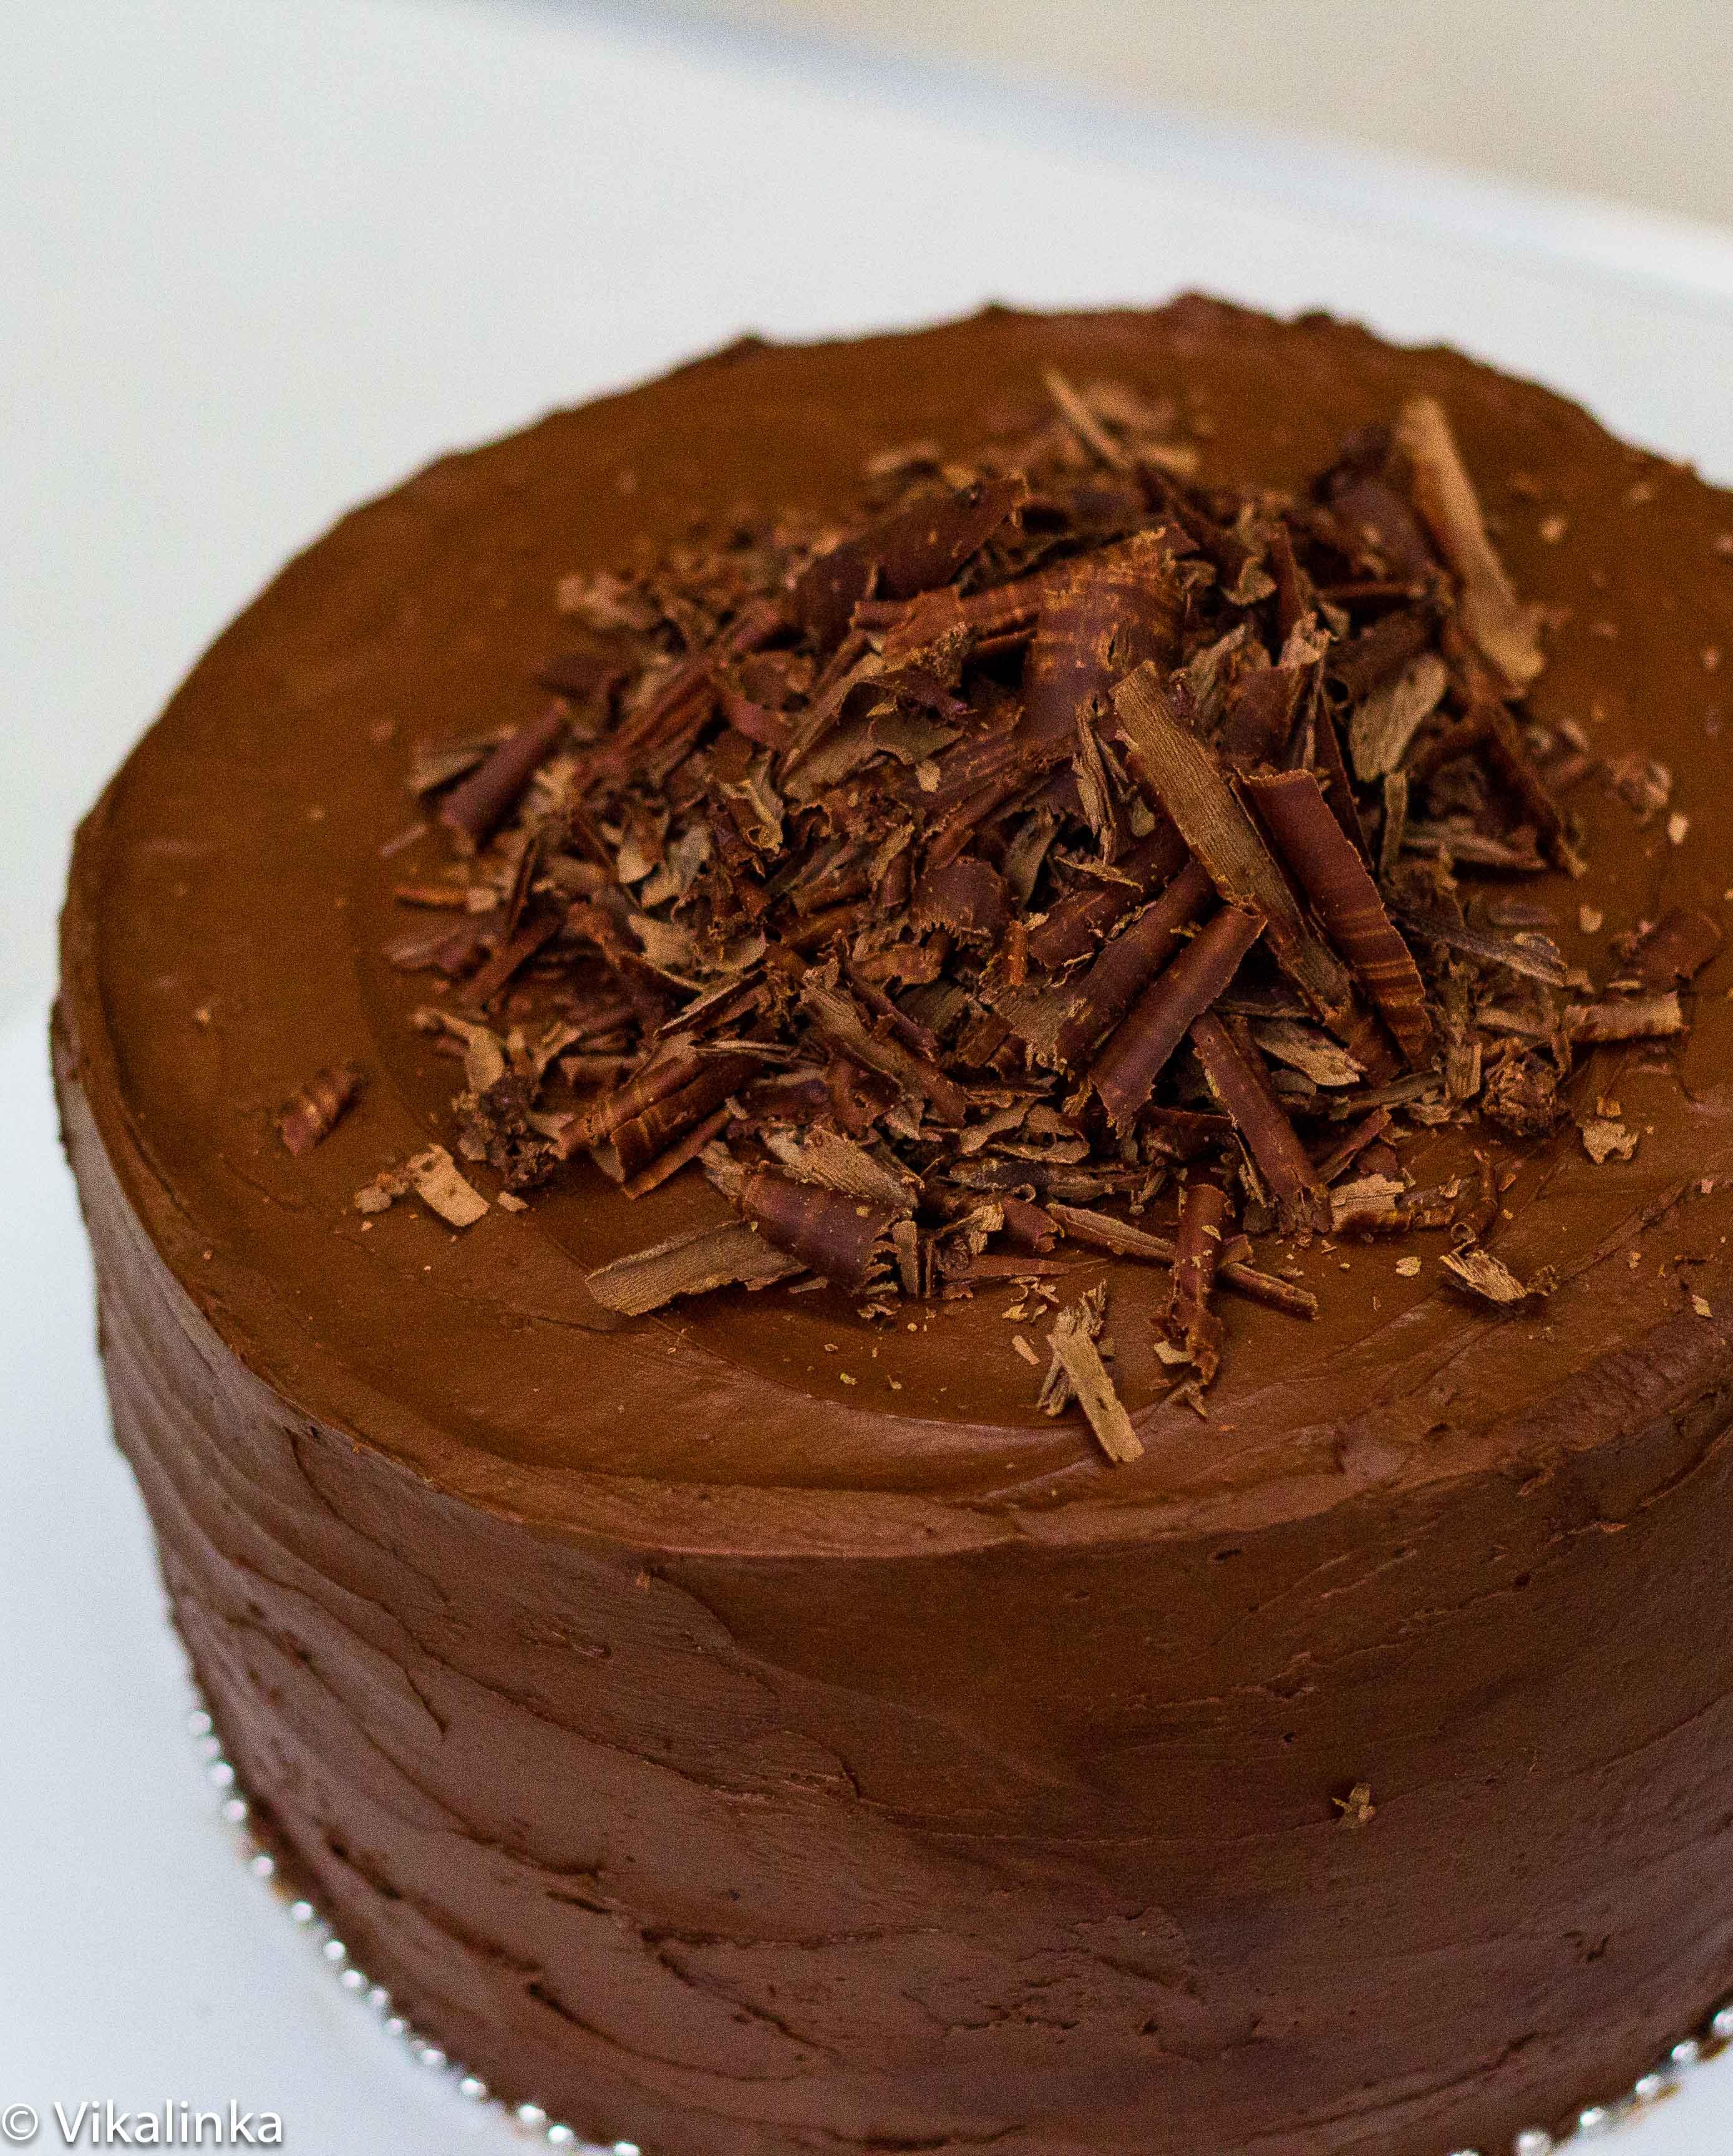 Chocolate Stout Cake And An Early New Year Resolution - Vikalinka